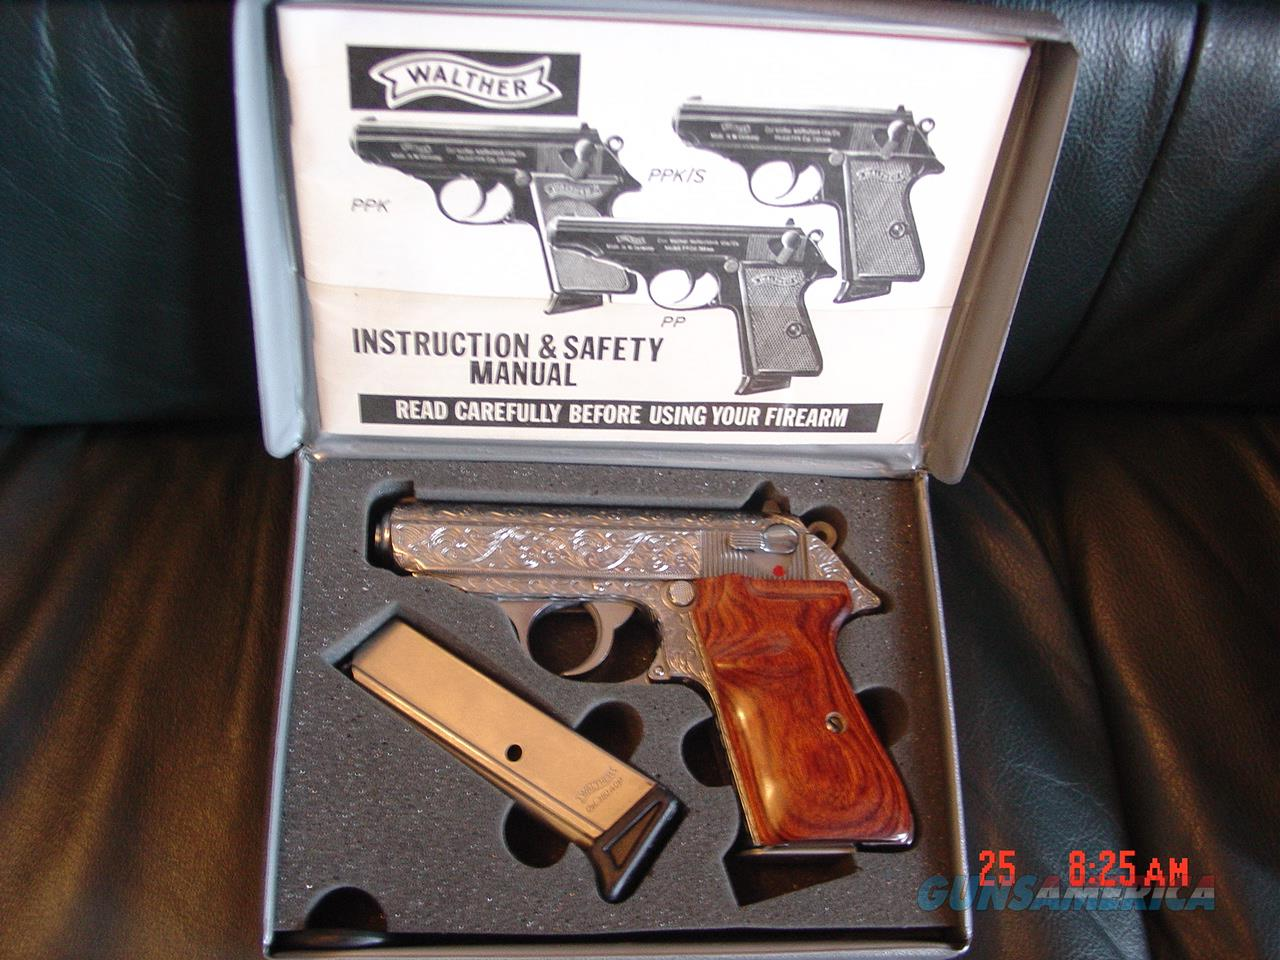 walther ppk s interarms 380 fully deep hand en for sale rh gunsamerica com Walther CO2 Pellet Pistol Walther Nighthawk Pellet Pistol Manual